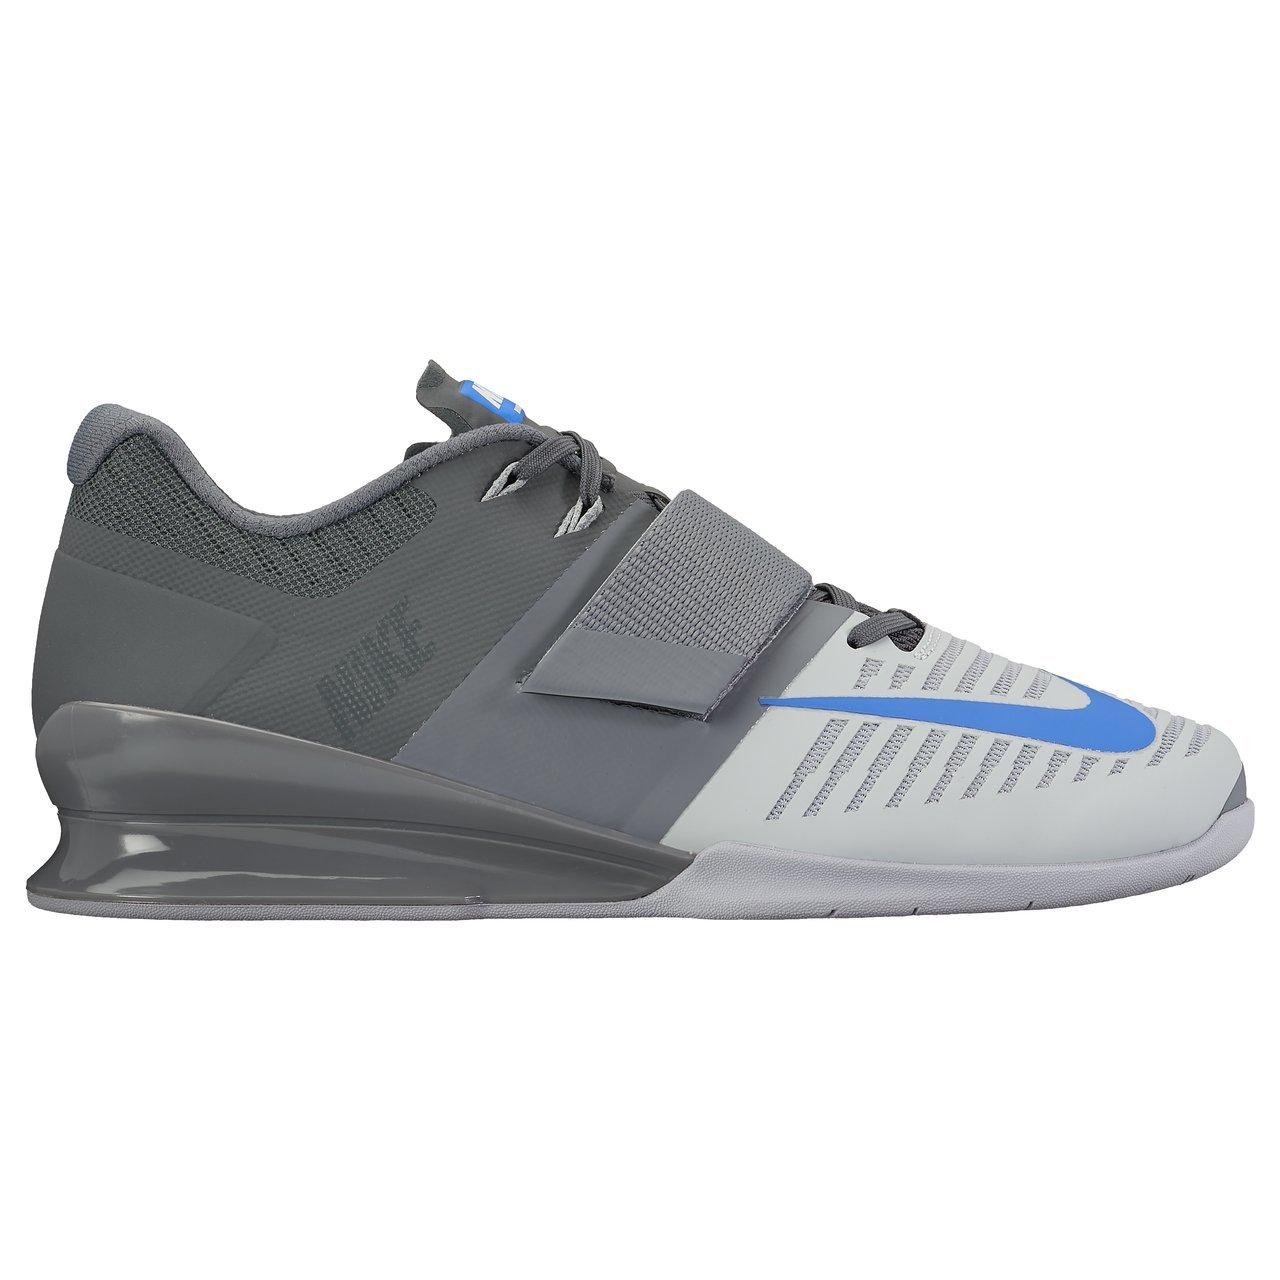 Schwarz Weiß Cool Grau Nike Romaleos II Power Lifting